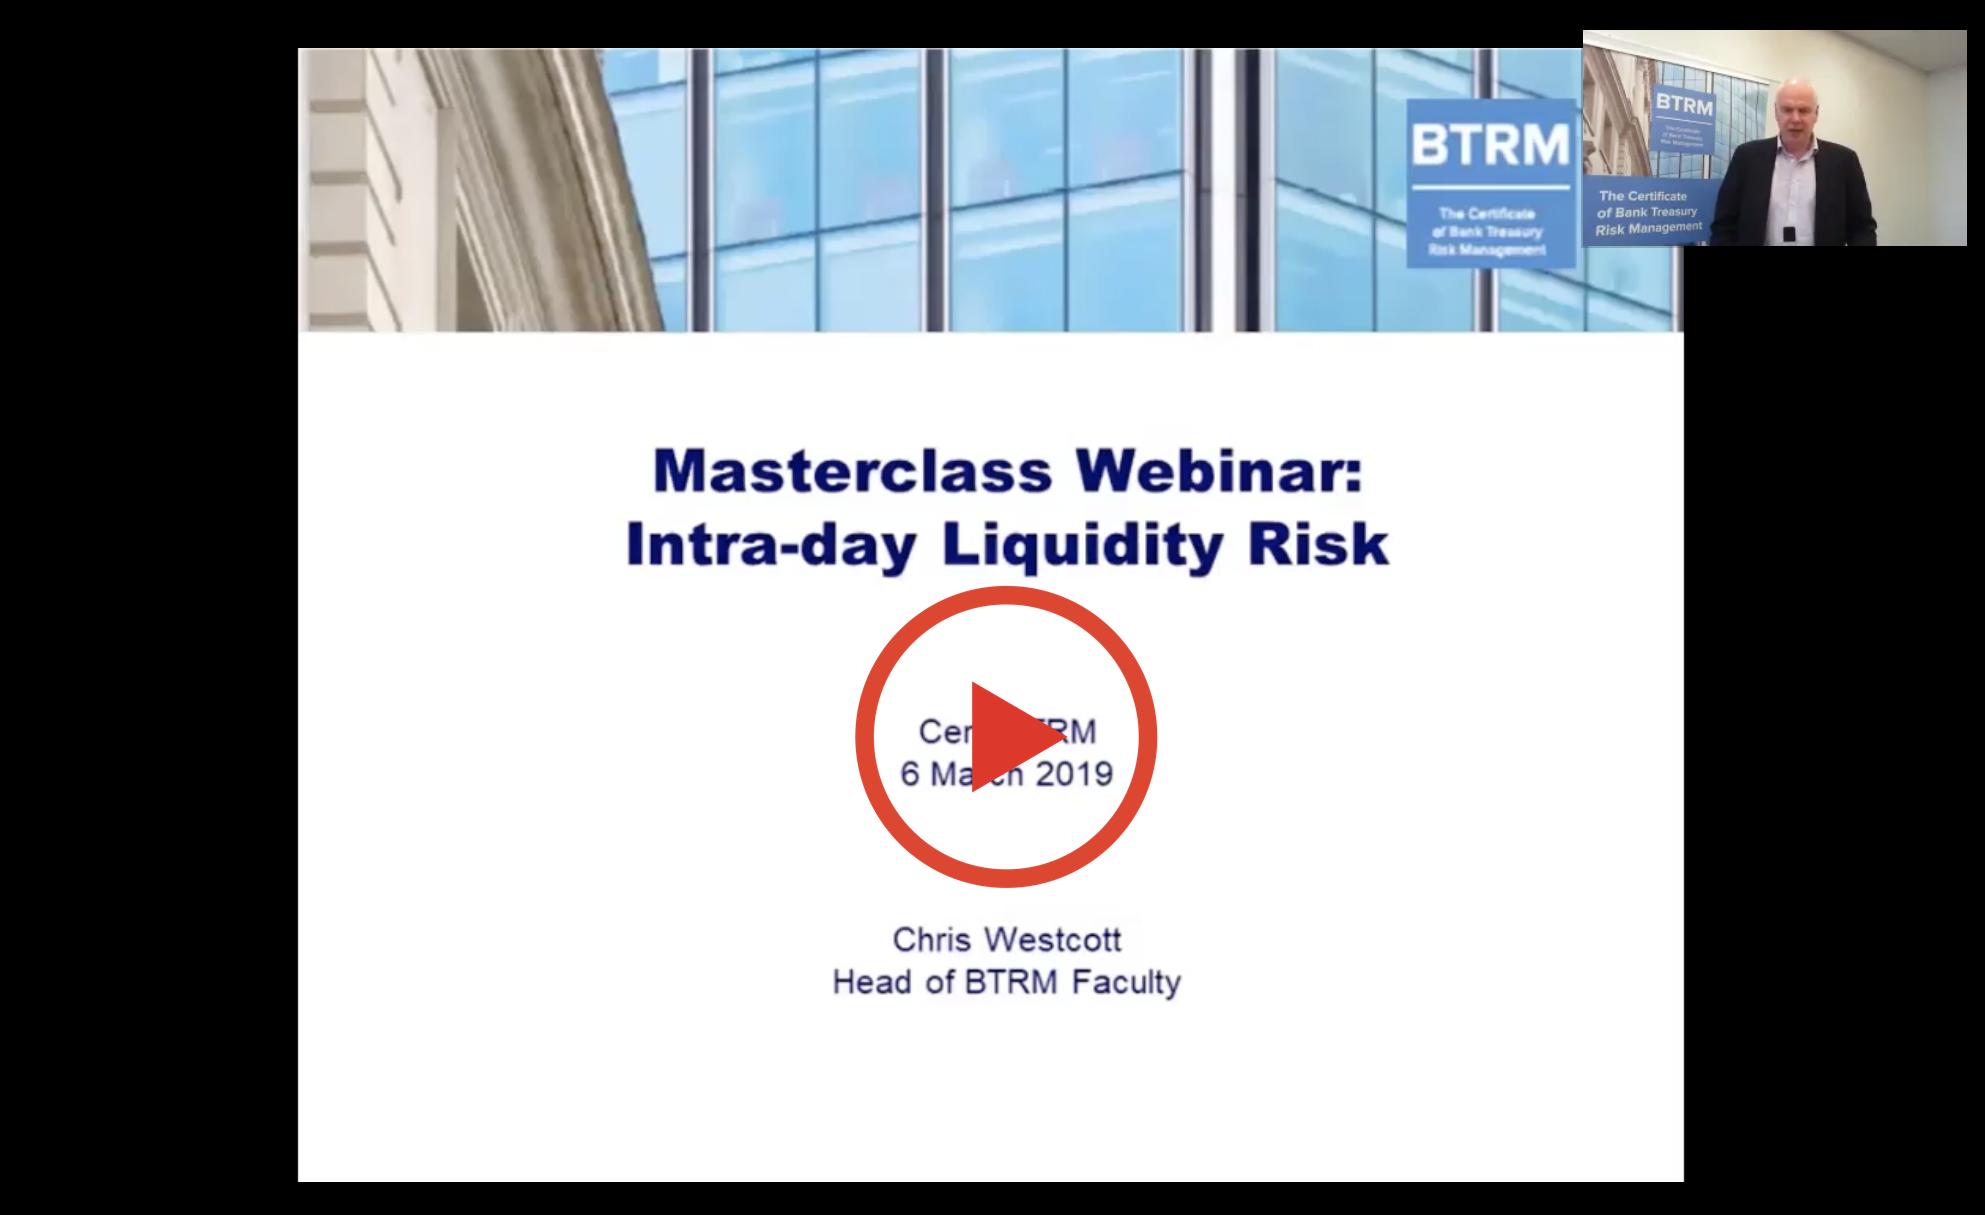 BTRM Webinar: Intra-day Liquidity Risk by Christopher Westcott